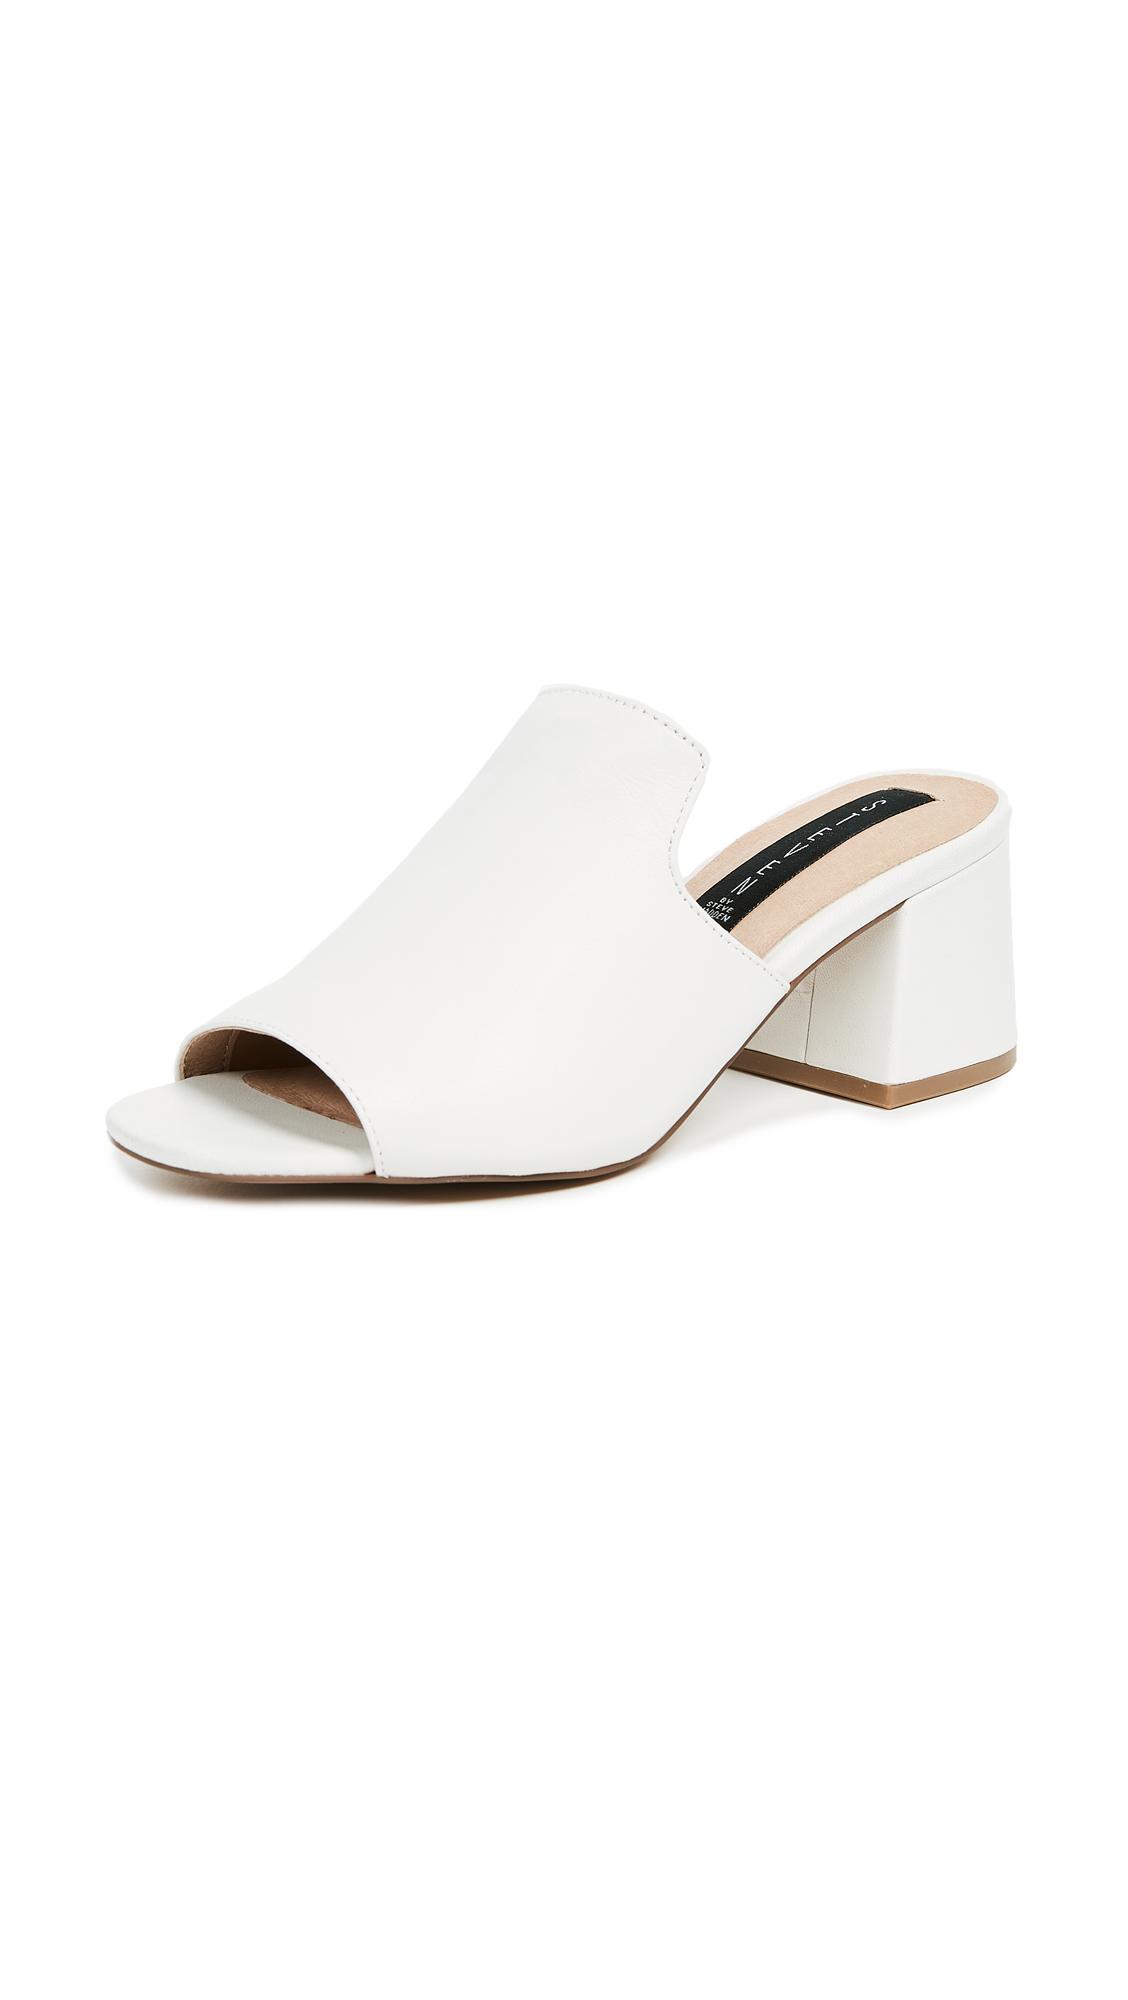 Steven Waze Block Heel Sandals - White